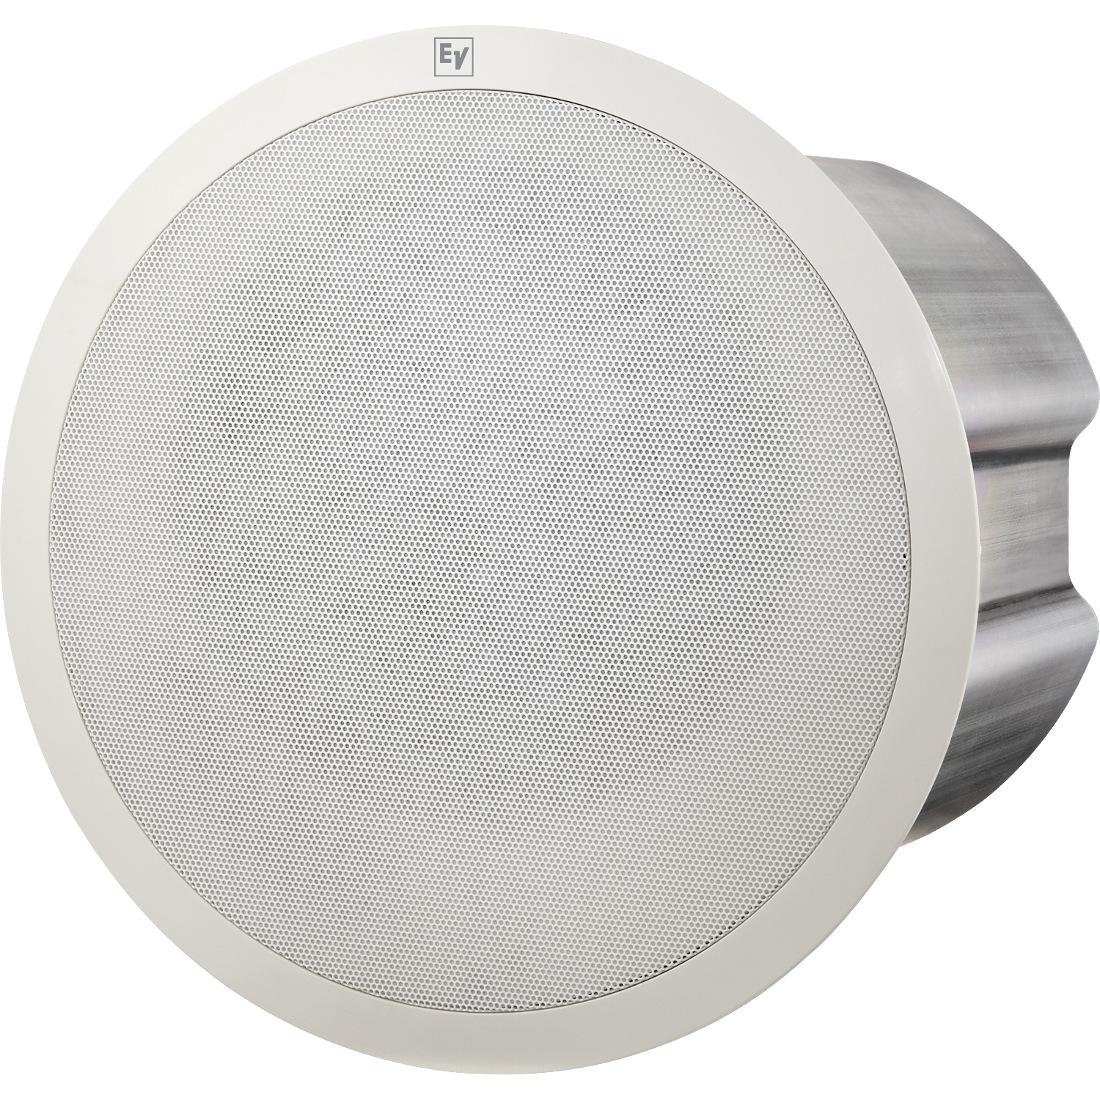 8-inch Two-Way Ceiling Speaker